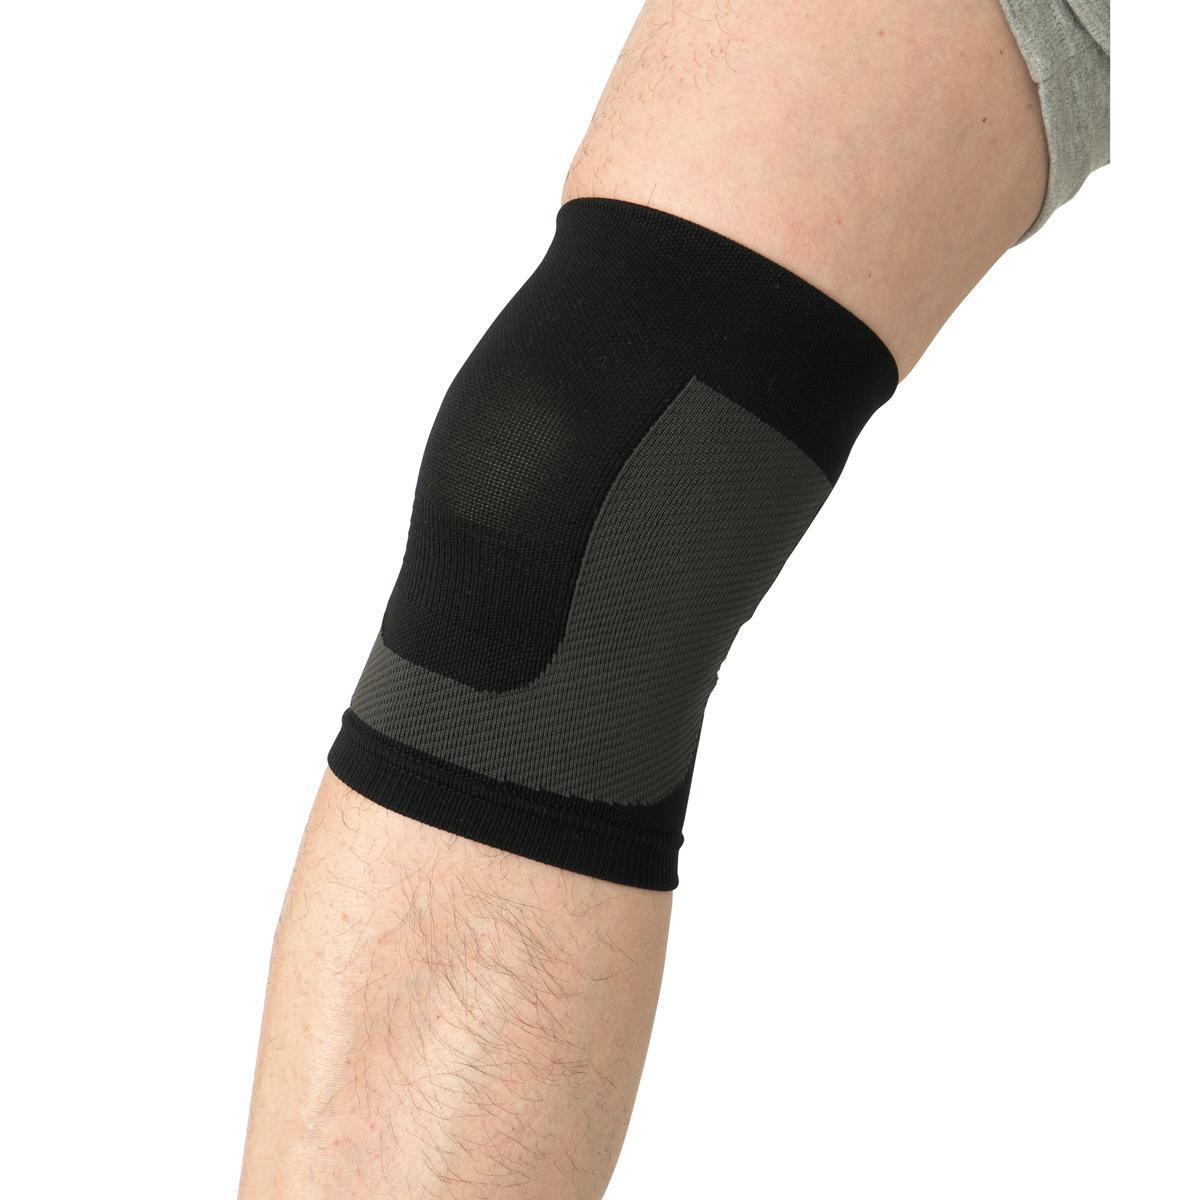 [cecile] 護膝(一個)/ 2020年秋季新商品, 精品男裝, 大尺碼男裝   JSHOPPERS.com